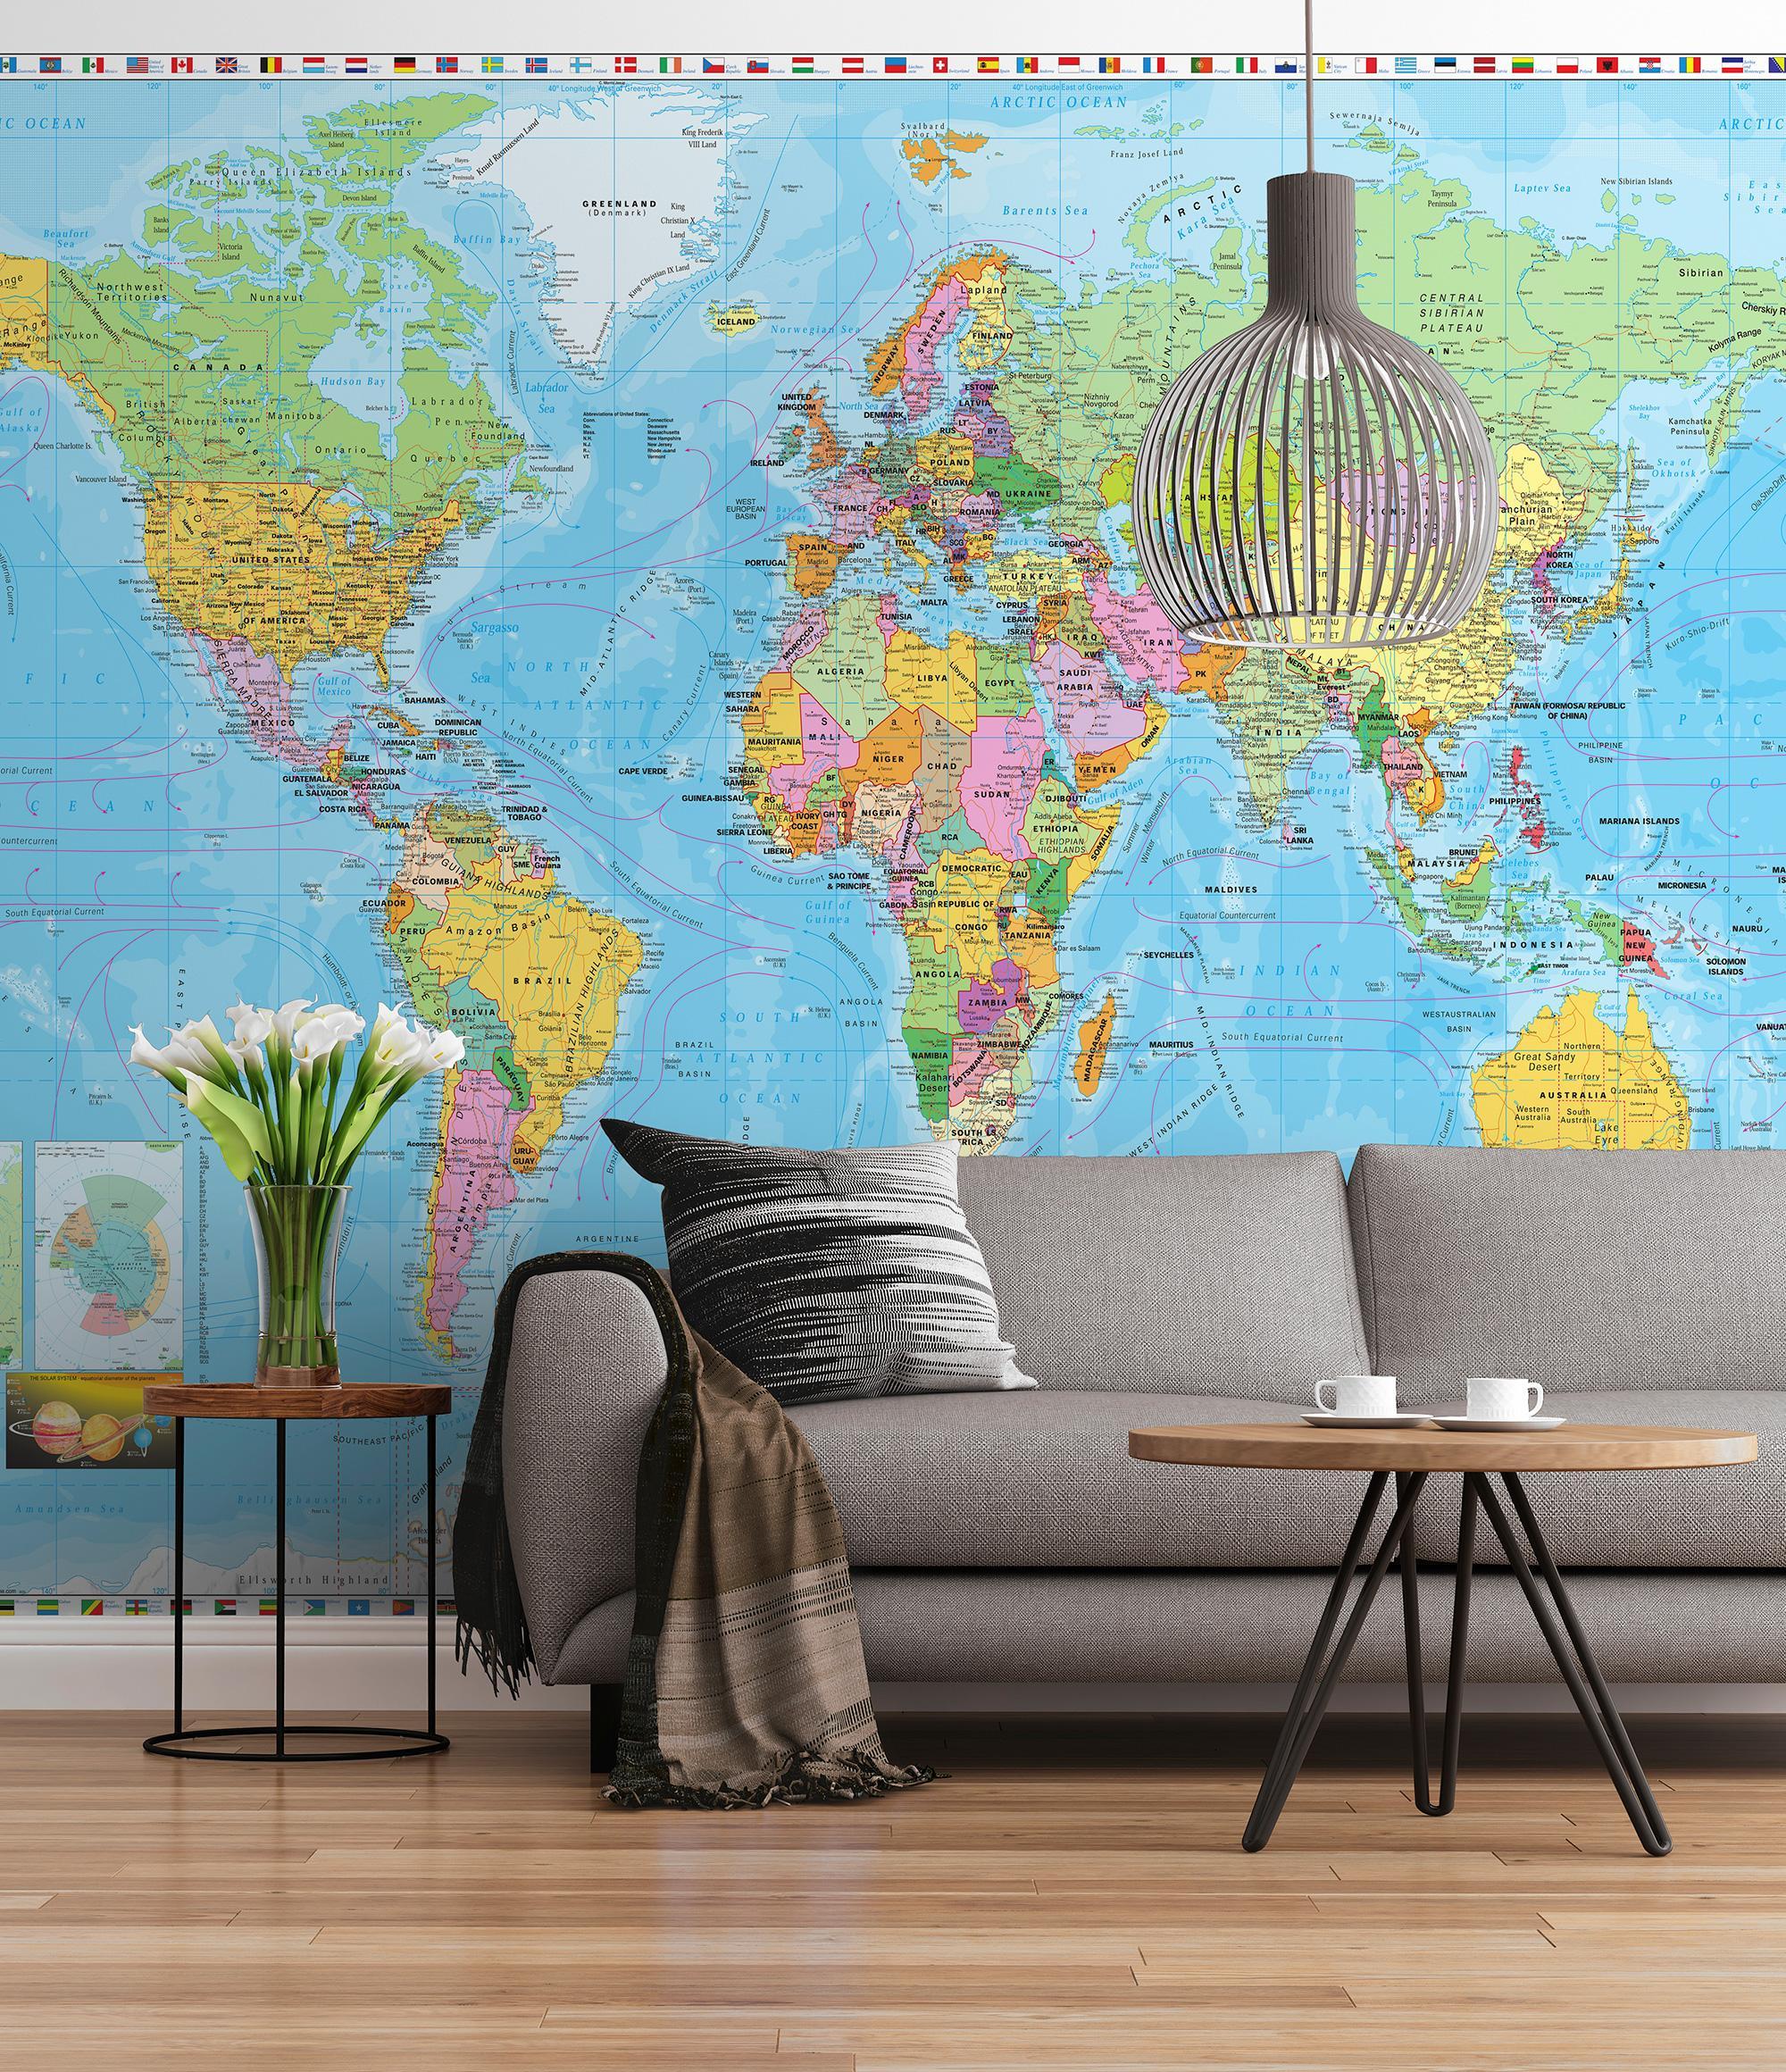 Sunny Decor Photo Mural U0027World Mapu0027, 1 Piece, Multicoloured, SD055